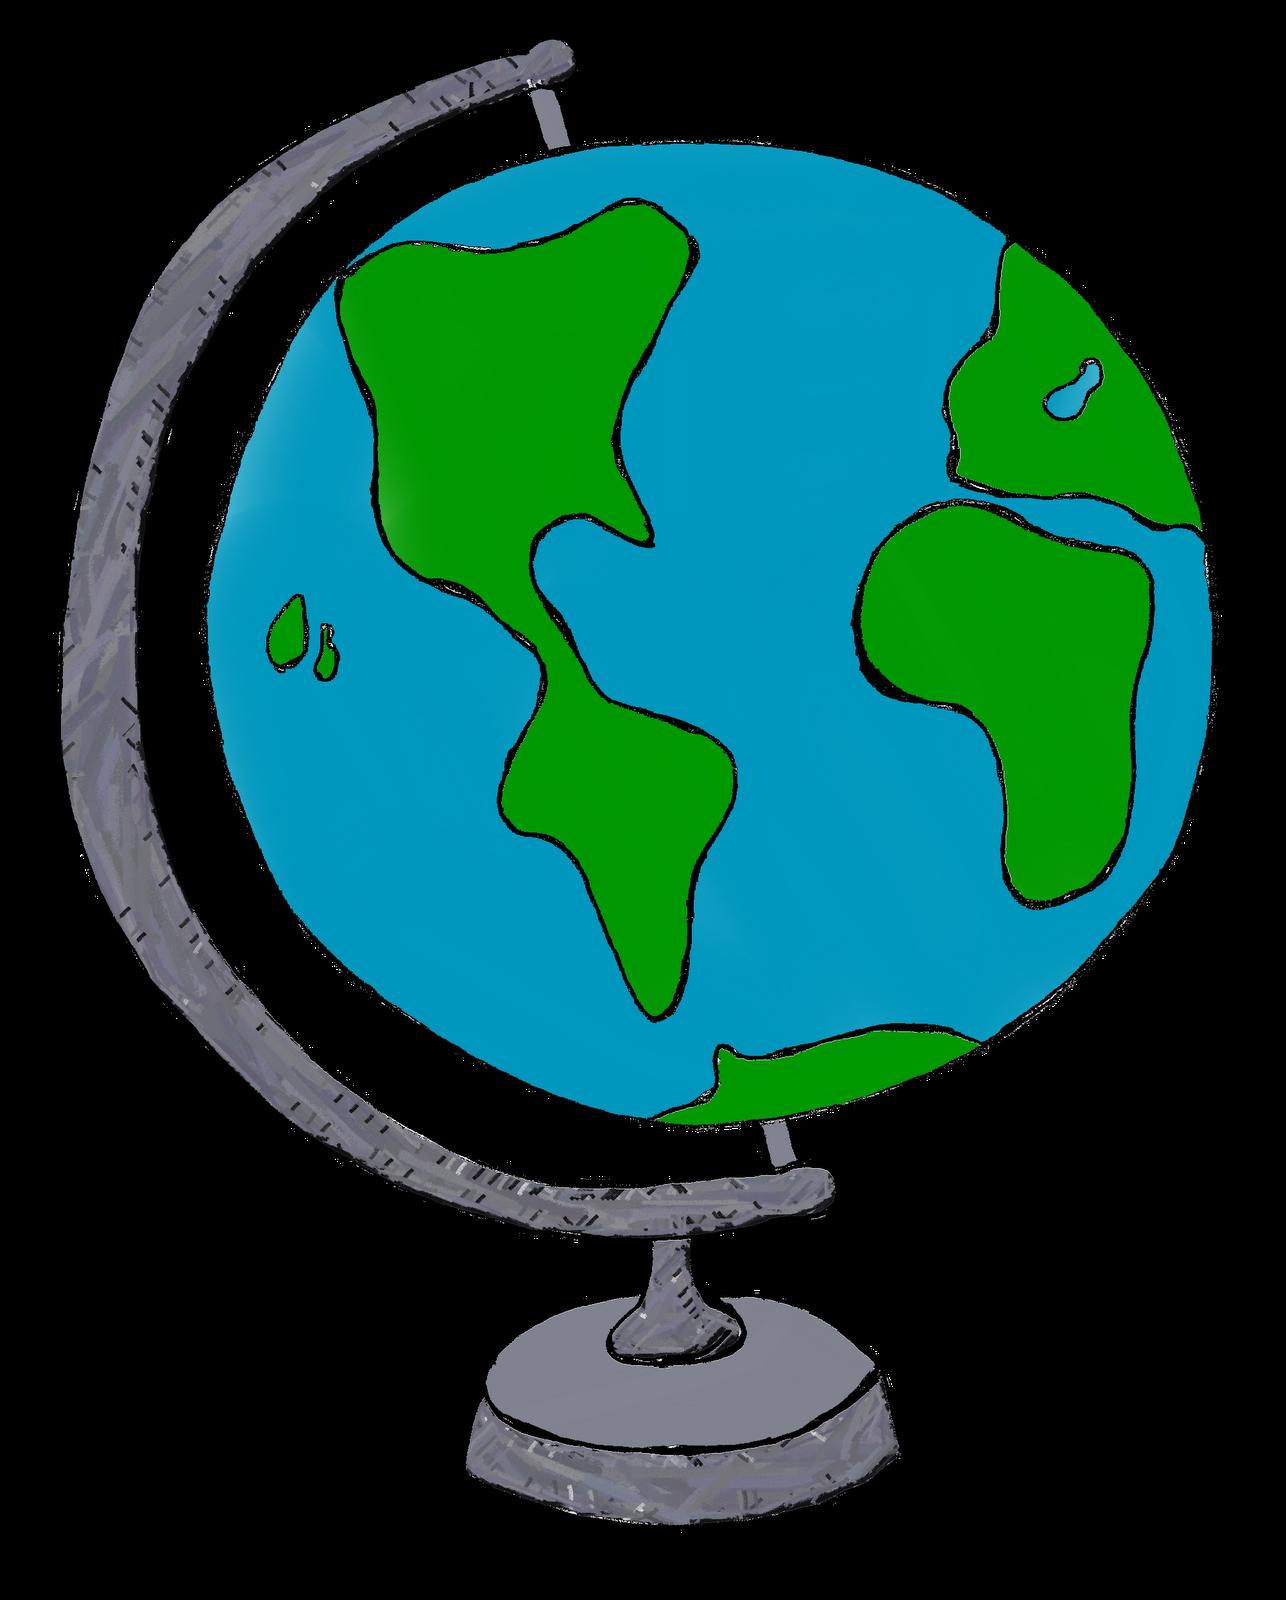 earth clipart u0026middot; free stock image